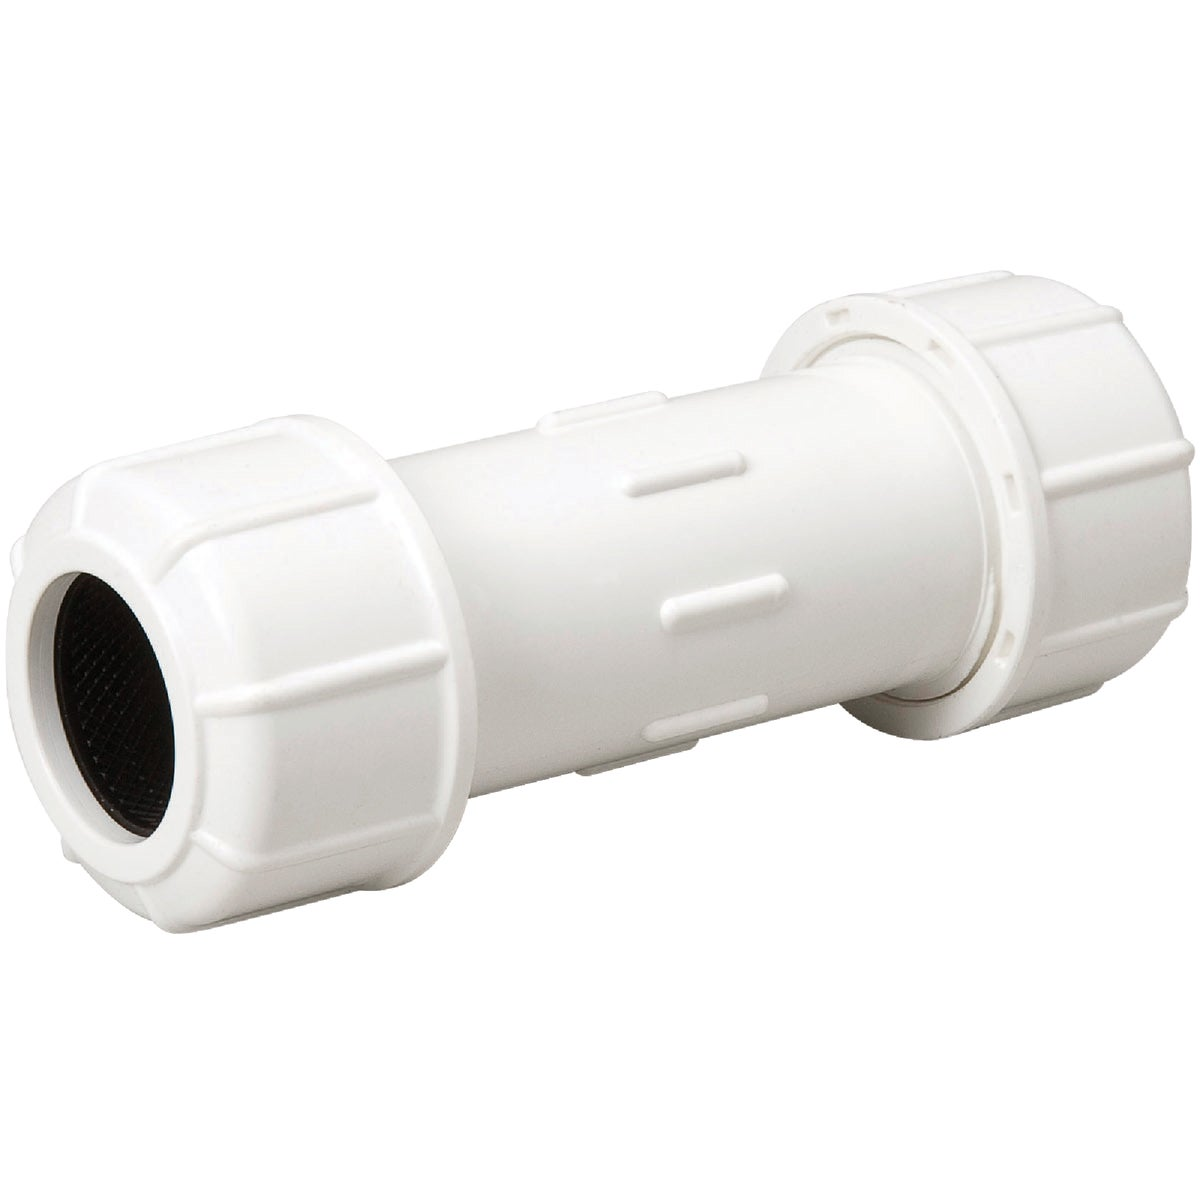 1-1/2X7 PVC COUPLING - 160-107 by Mueller B K